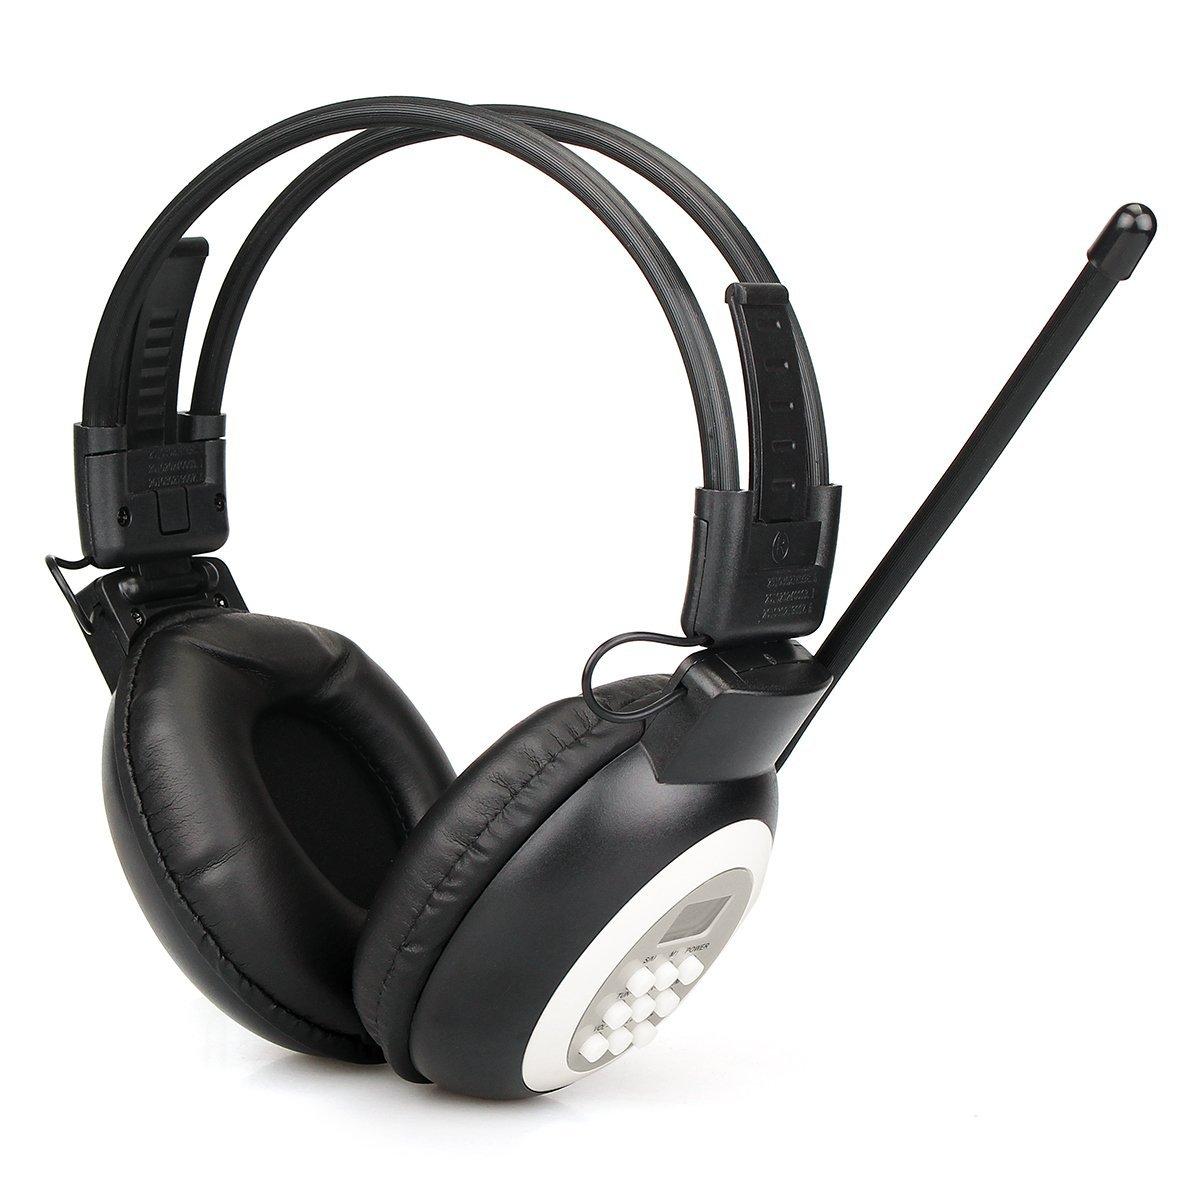 Retekess Walkman Headphone Headset Presets